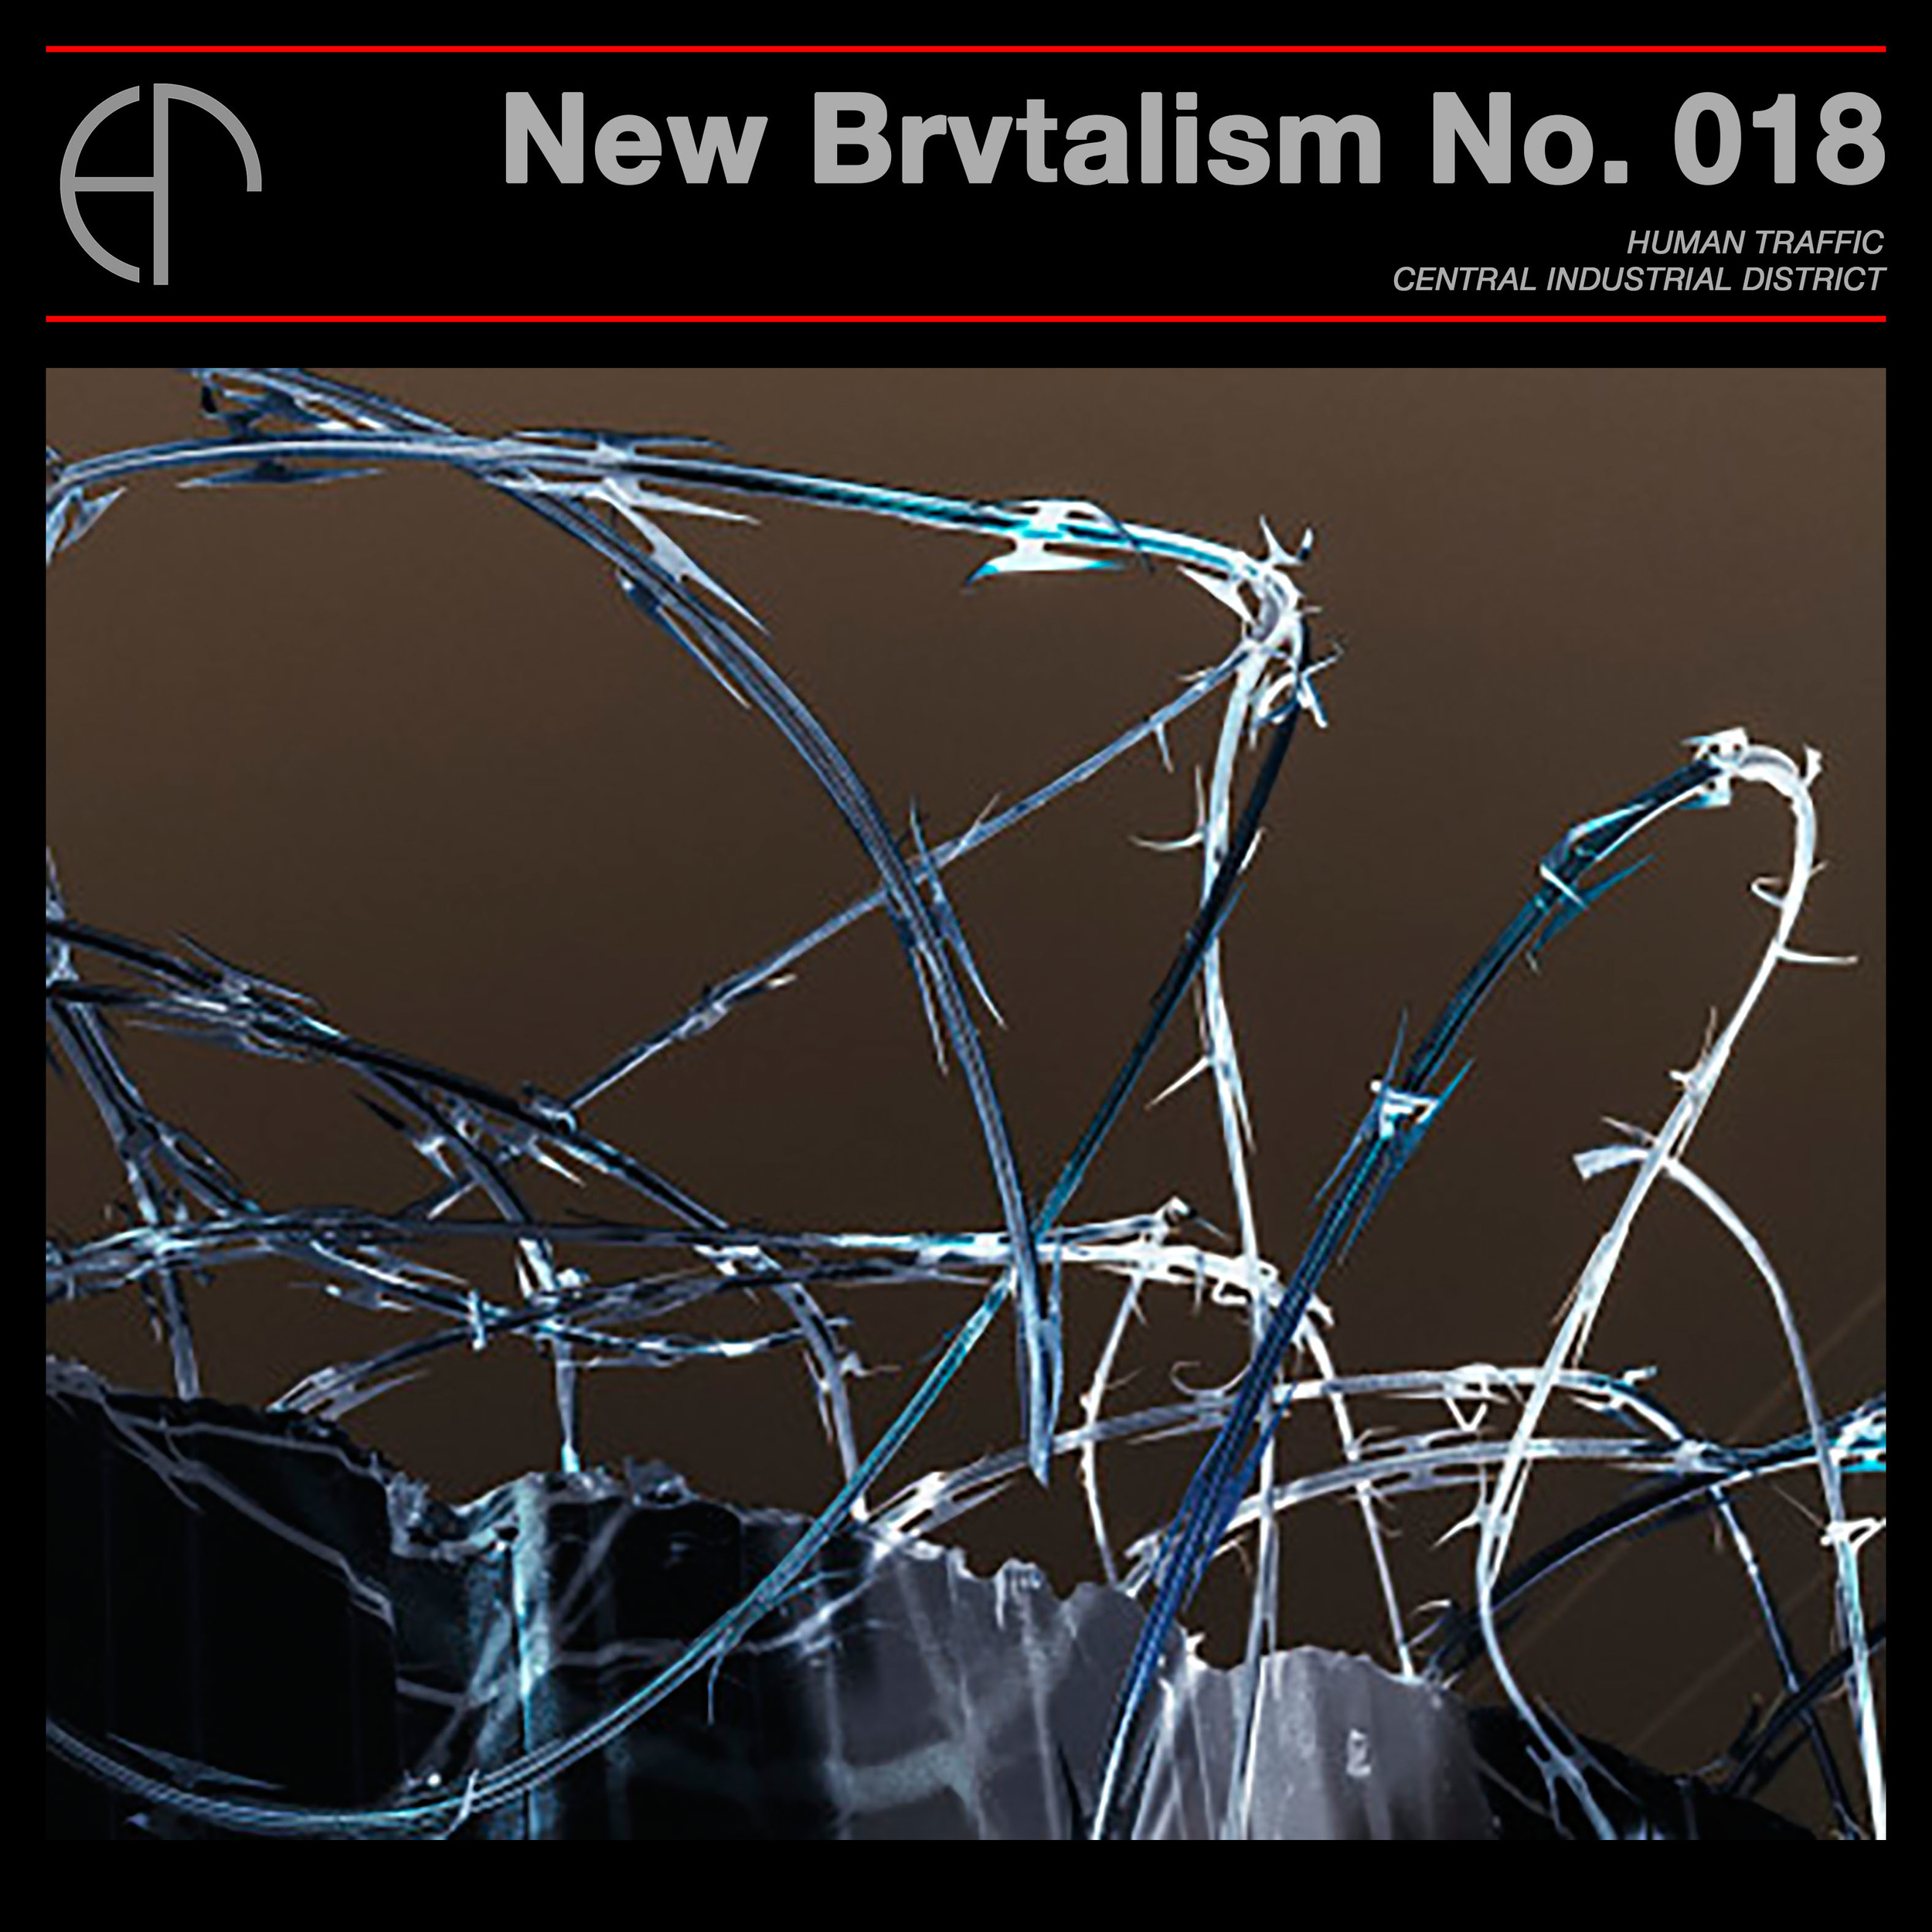 NewBrvtalismNo.018.jpg